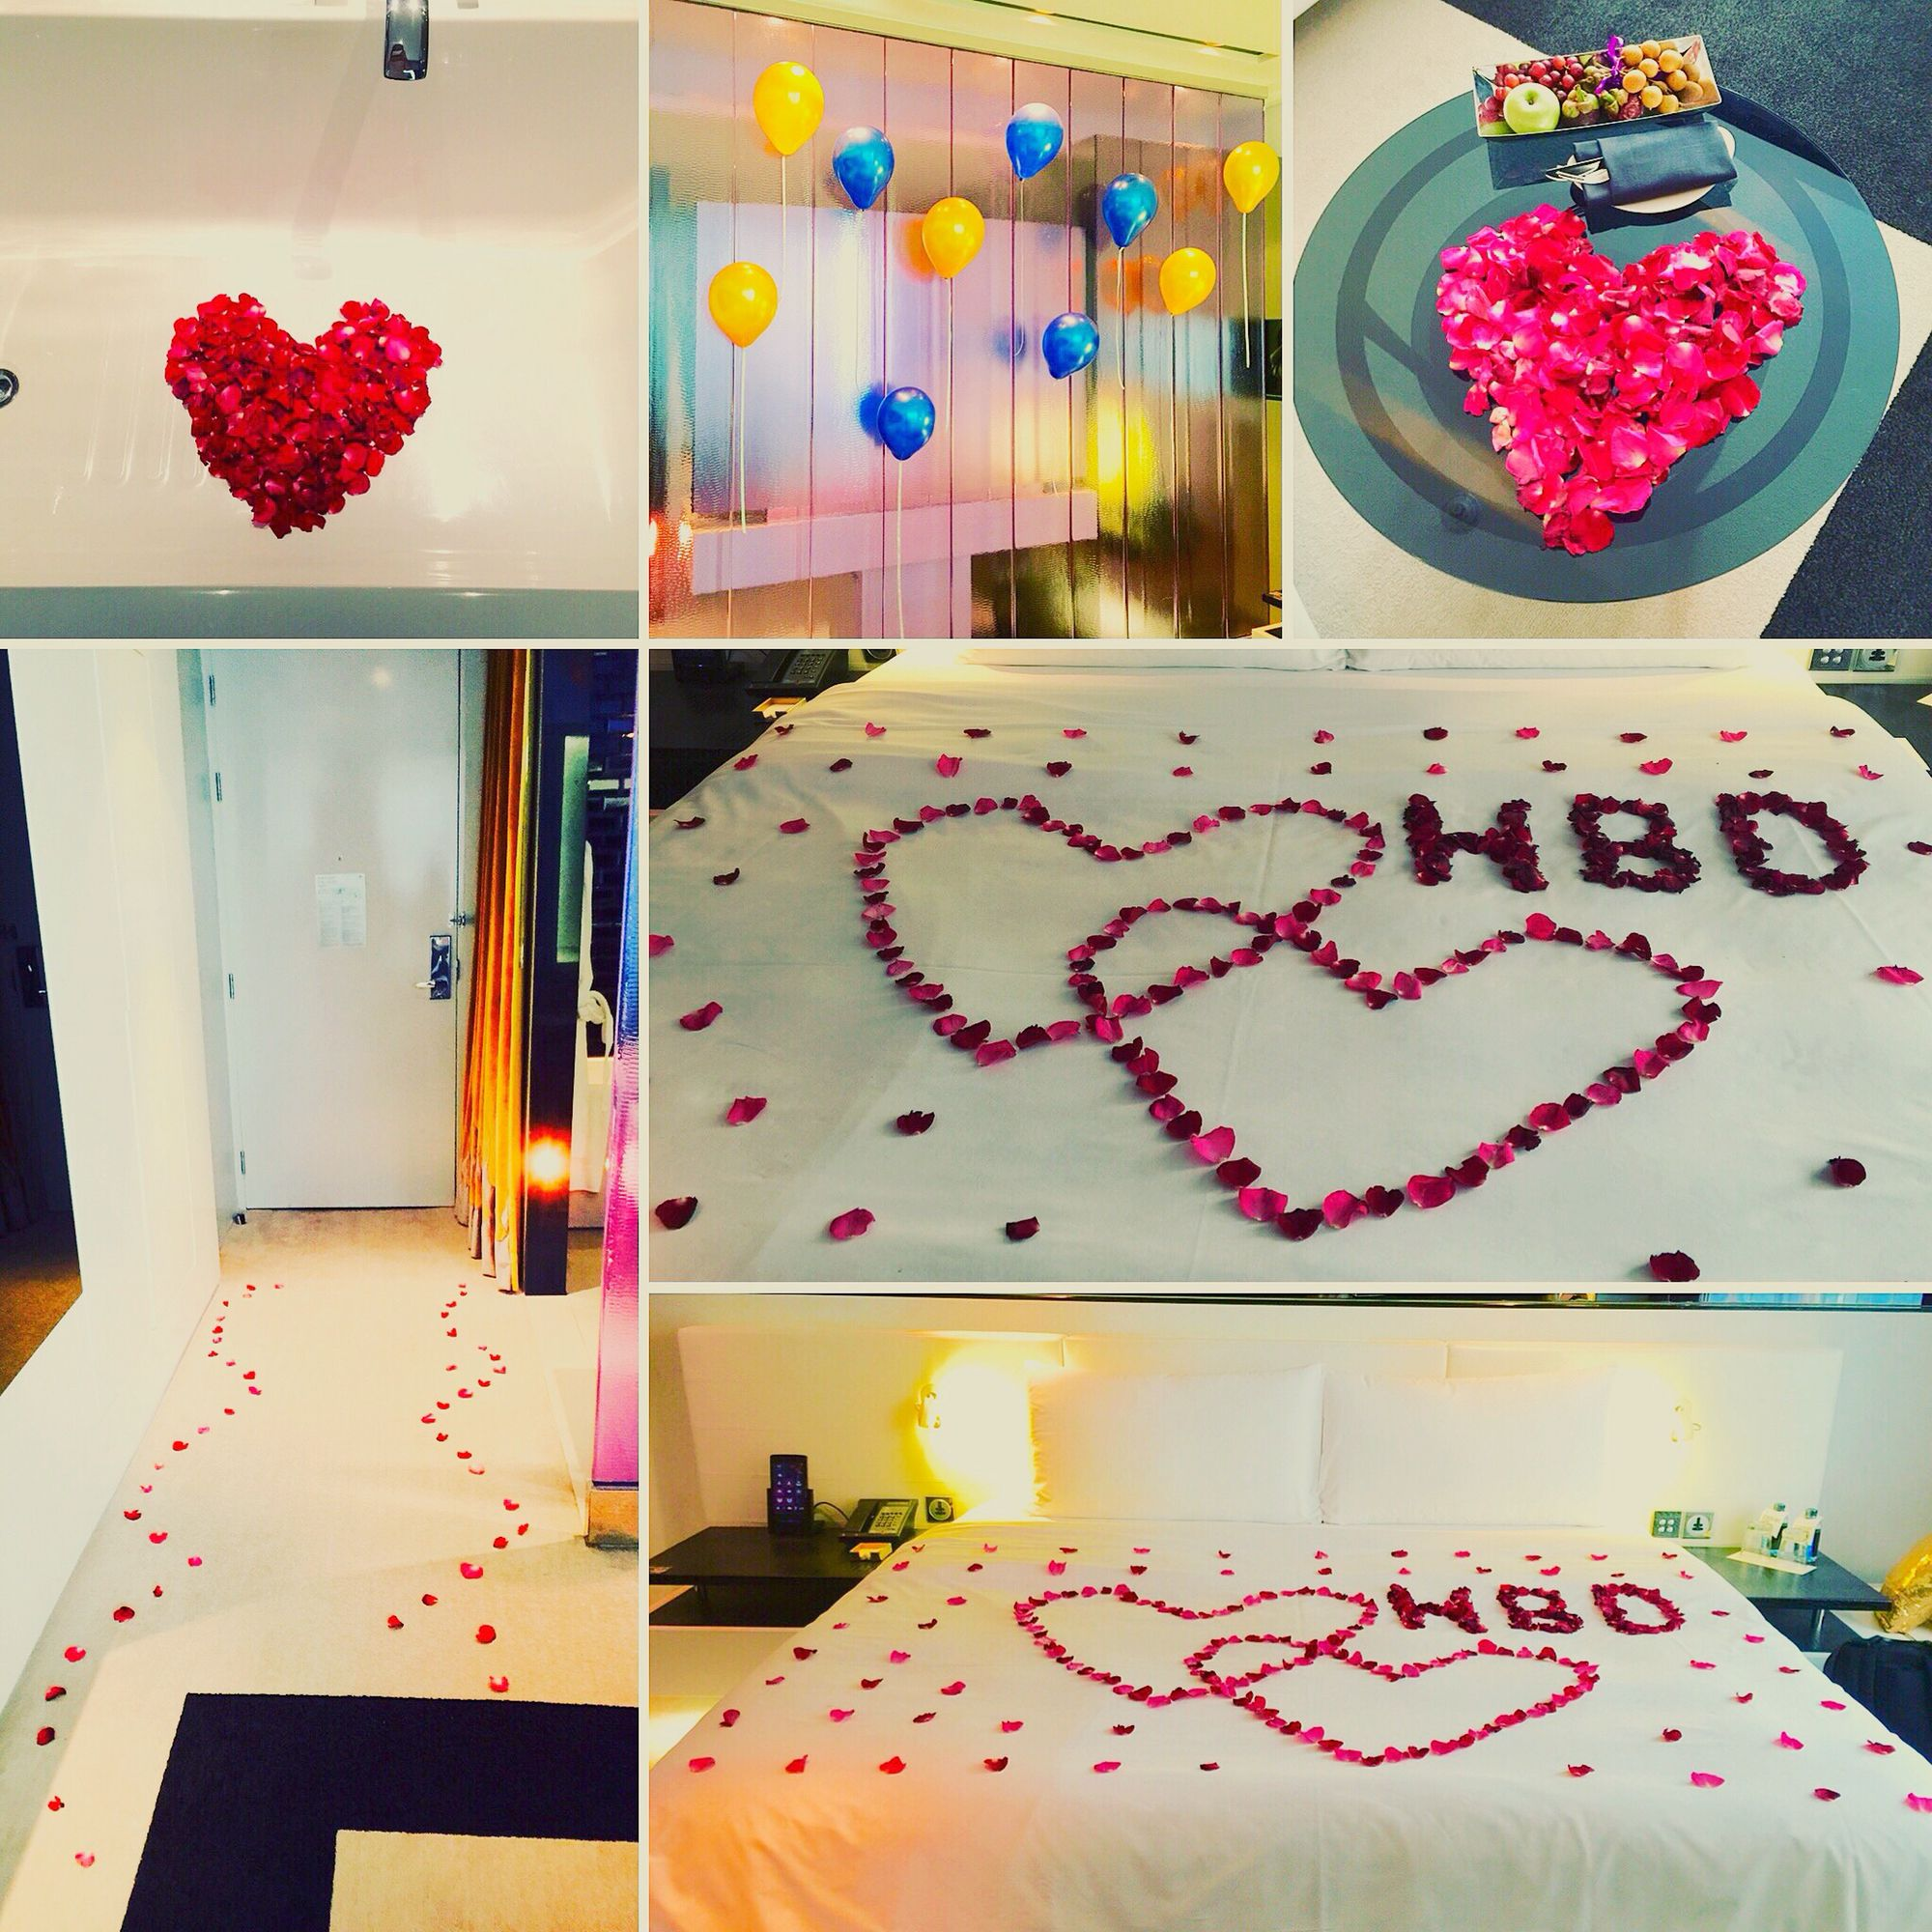 Oct 2015 W Bangkok Wonderful Room Specially Decorated For A Birthday Celebration Wbangkok Whotels Birthday Cards Diy Resort Decor Valentine Crafts